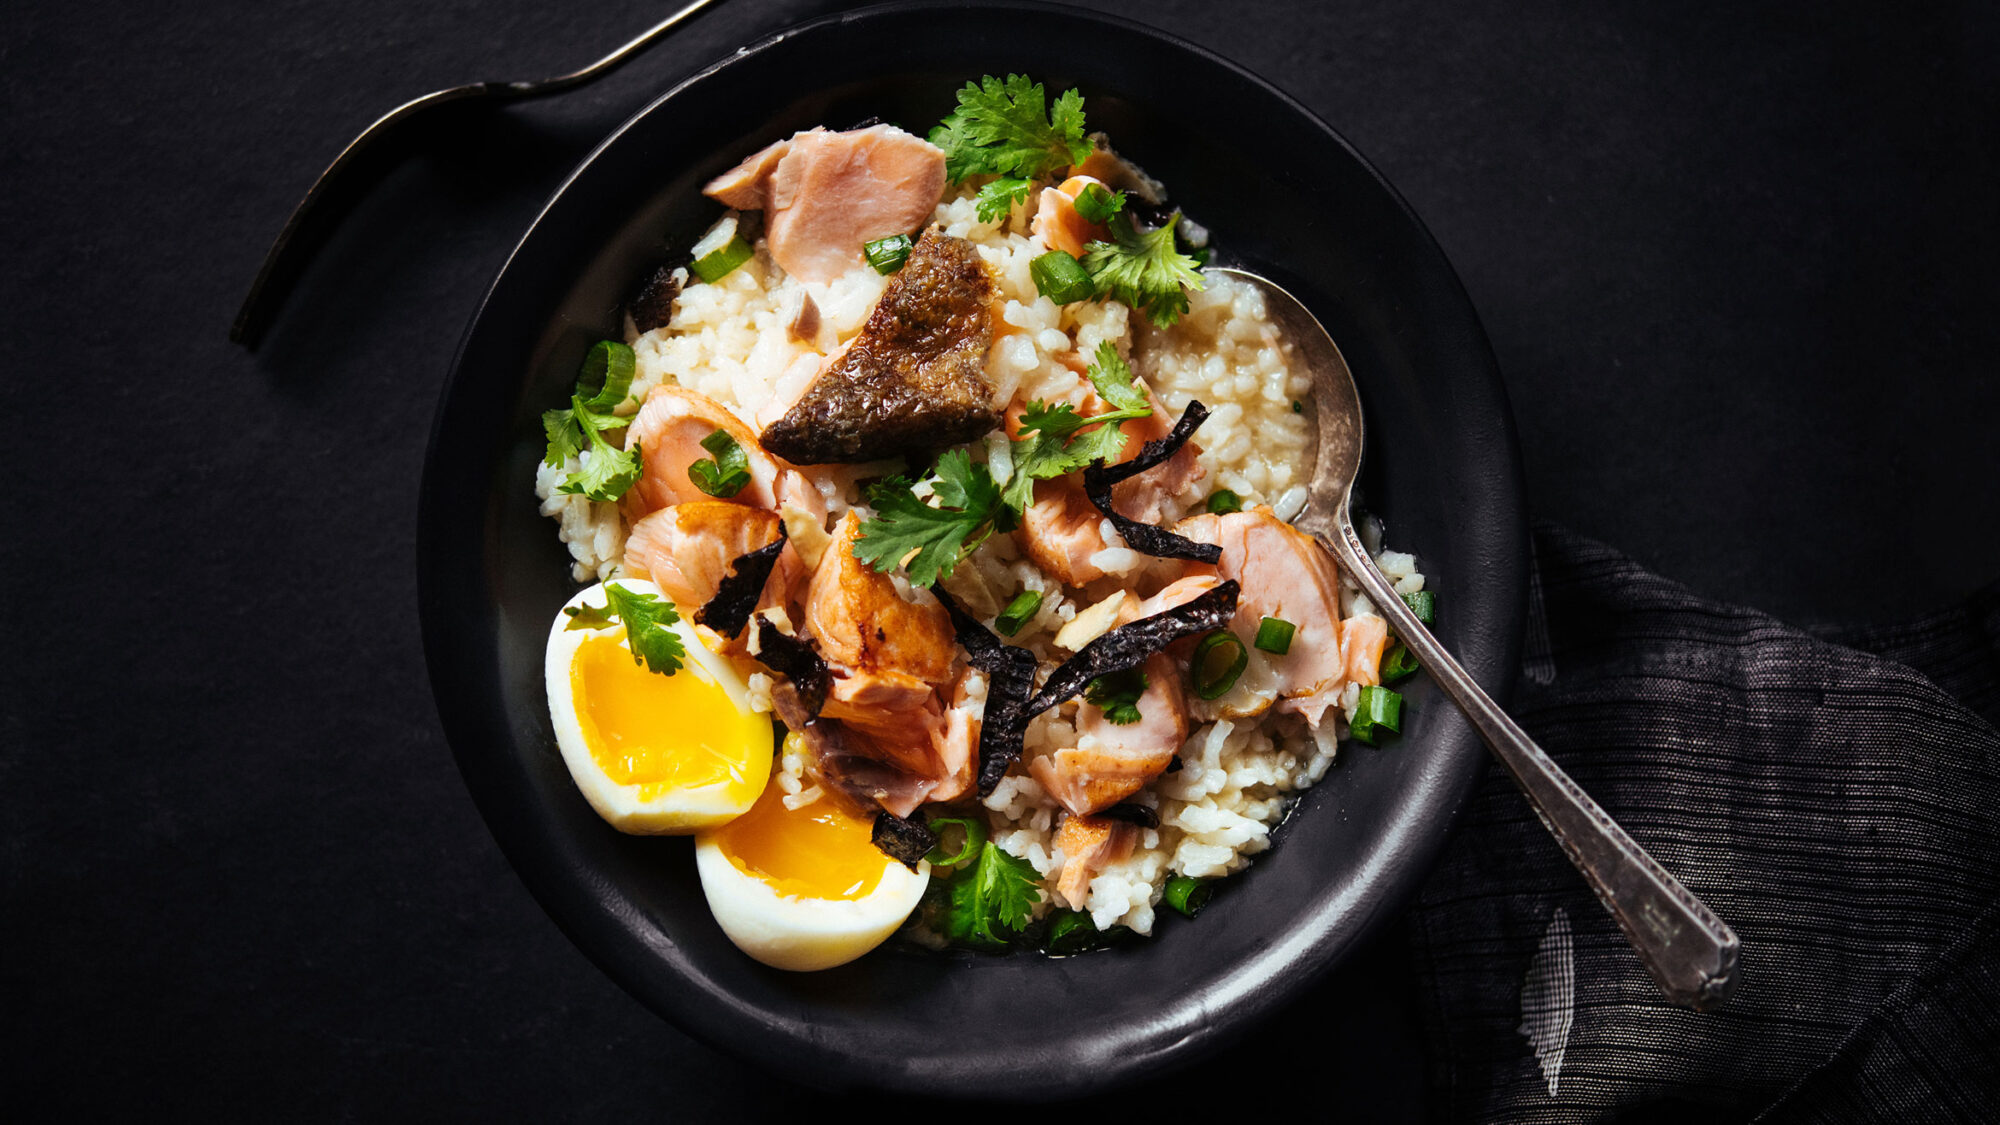 R-Article-Ochazuke-Green-Tea-Rice-Salmon-Egg-Recipe